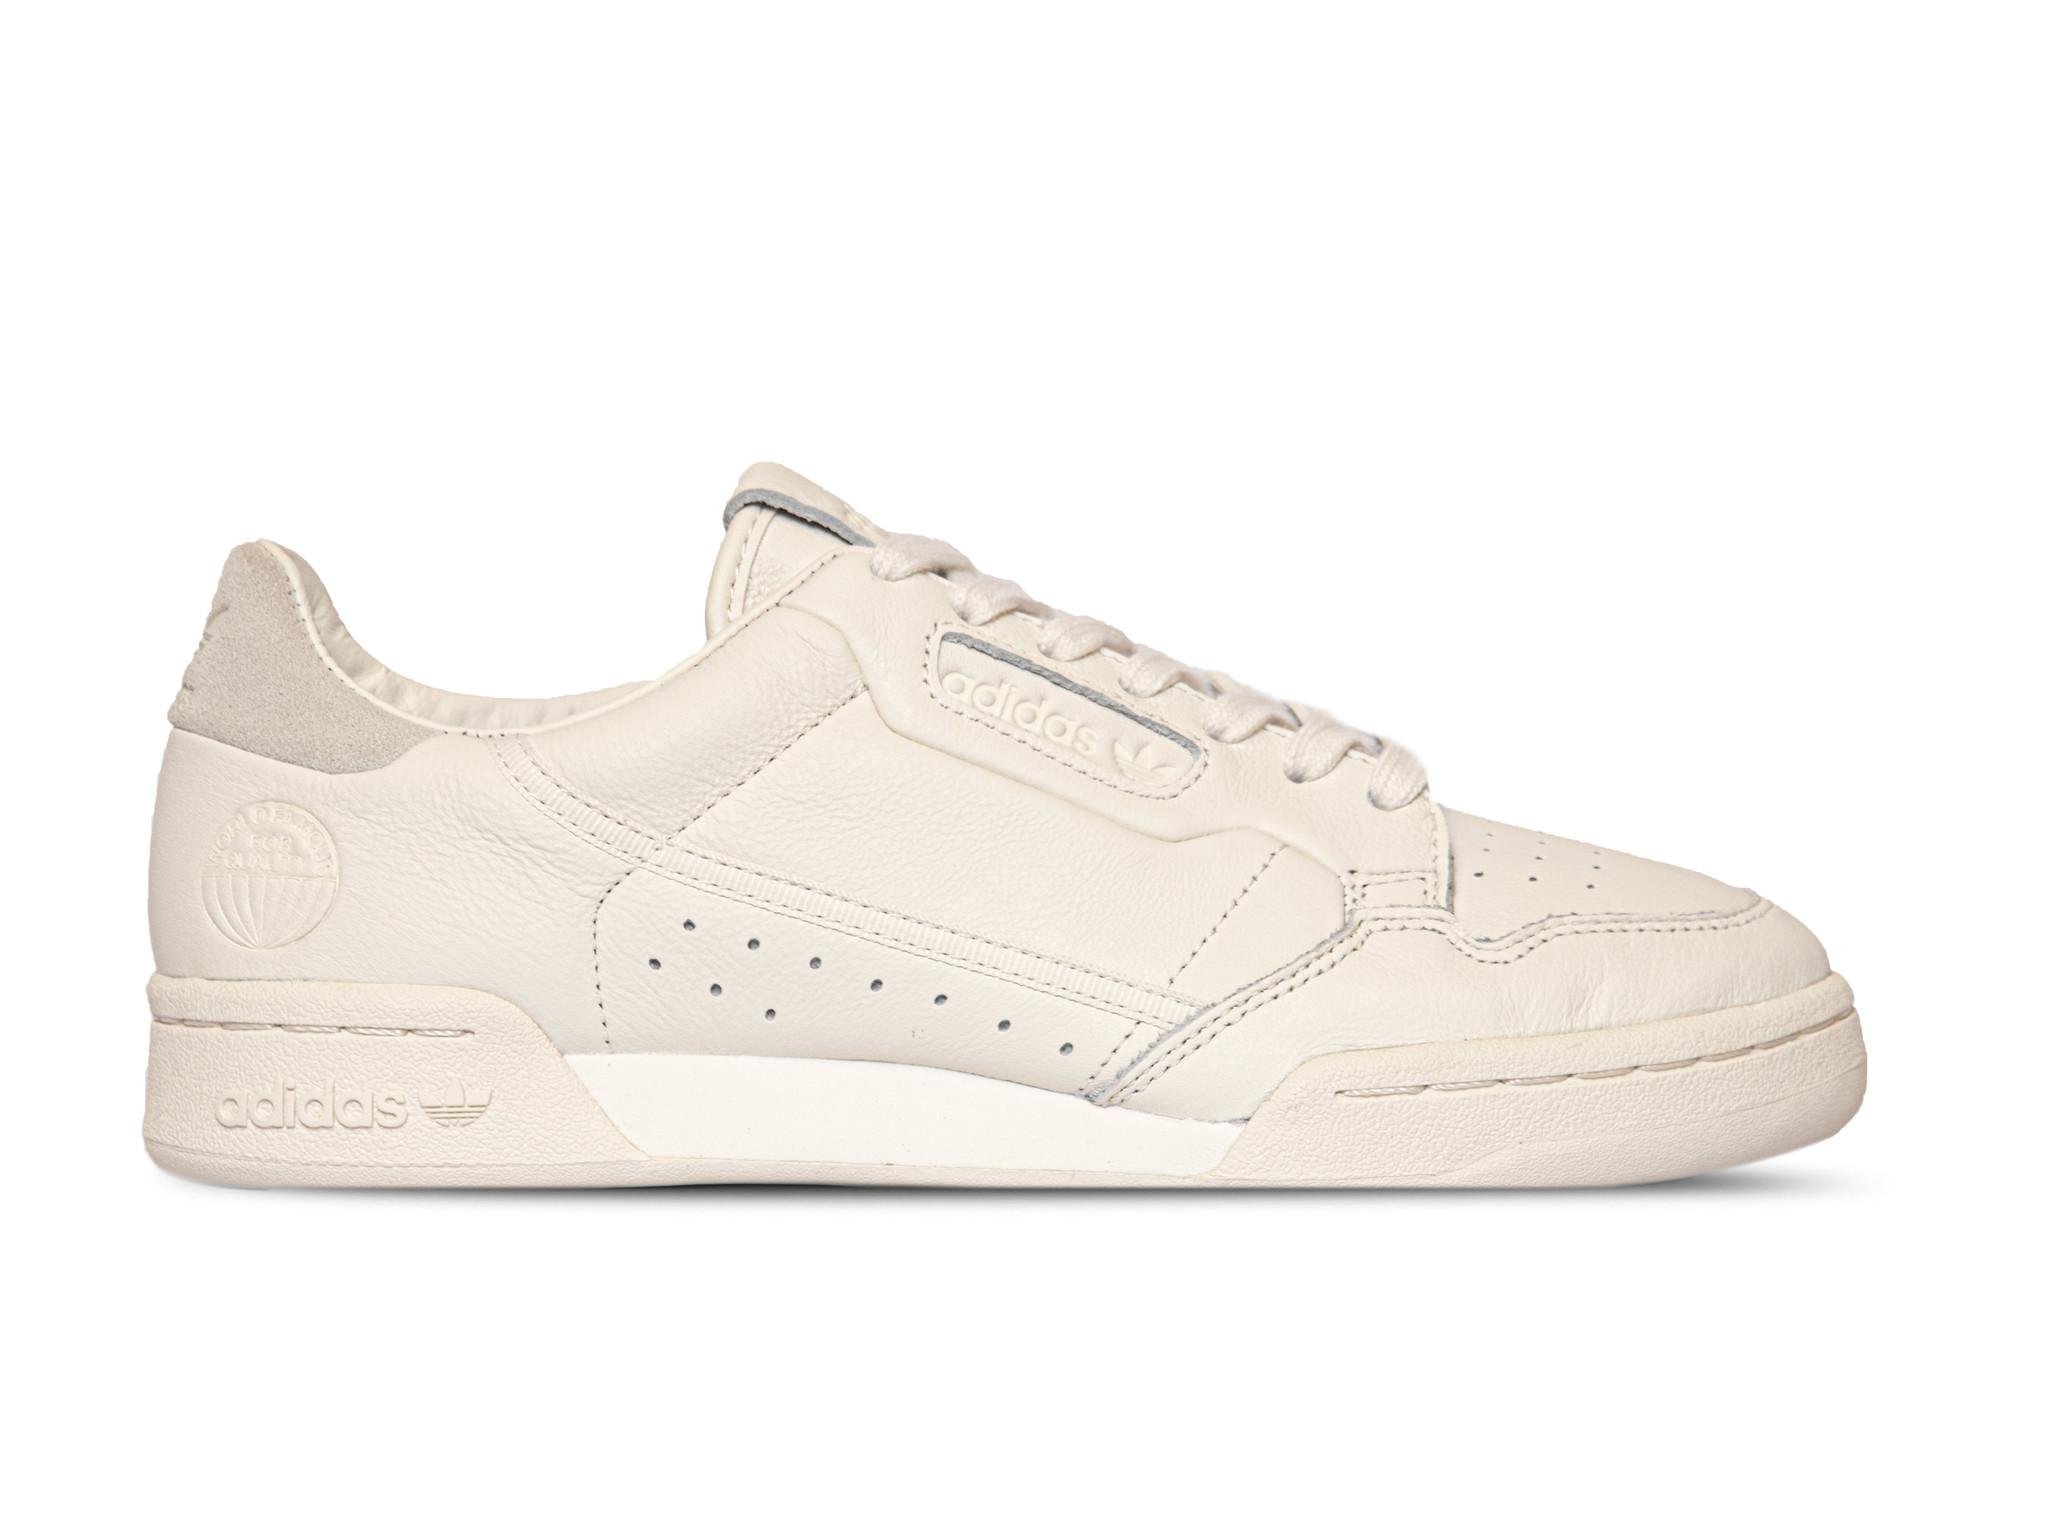 Adidas Continental 80 Off White EG6719 Bruut Sneakers